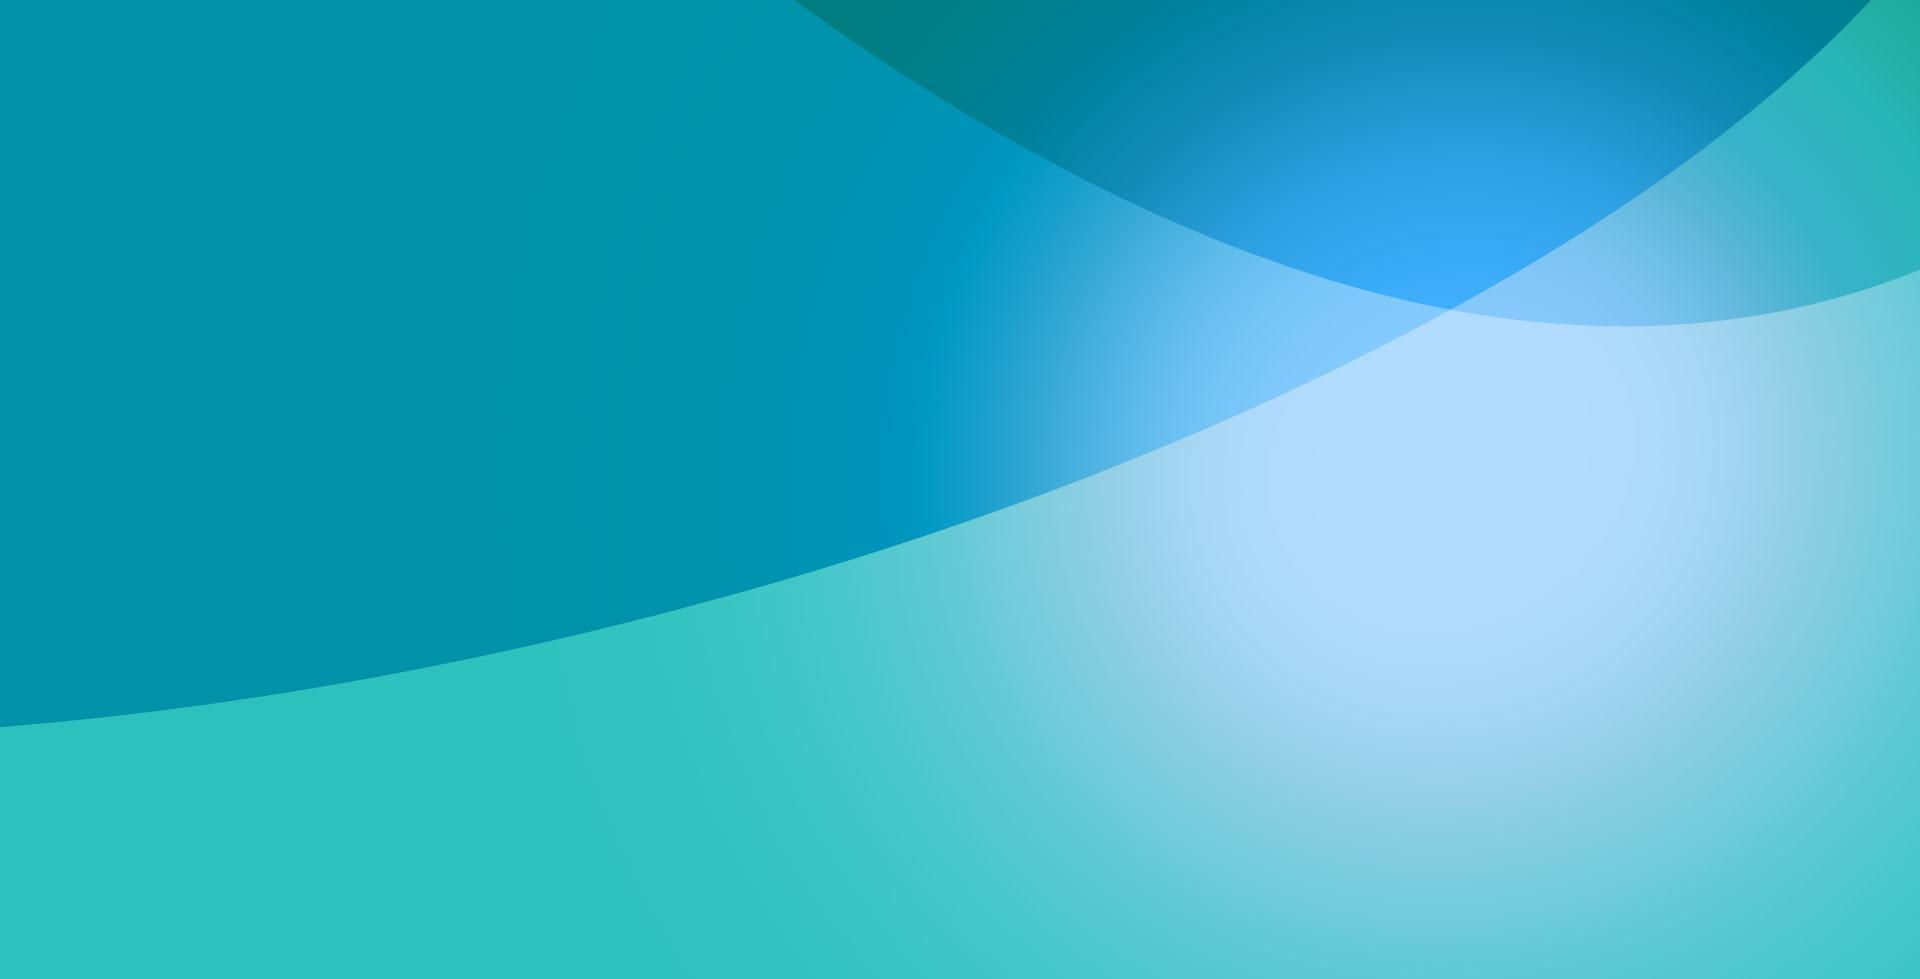 paralax-blue-3